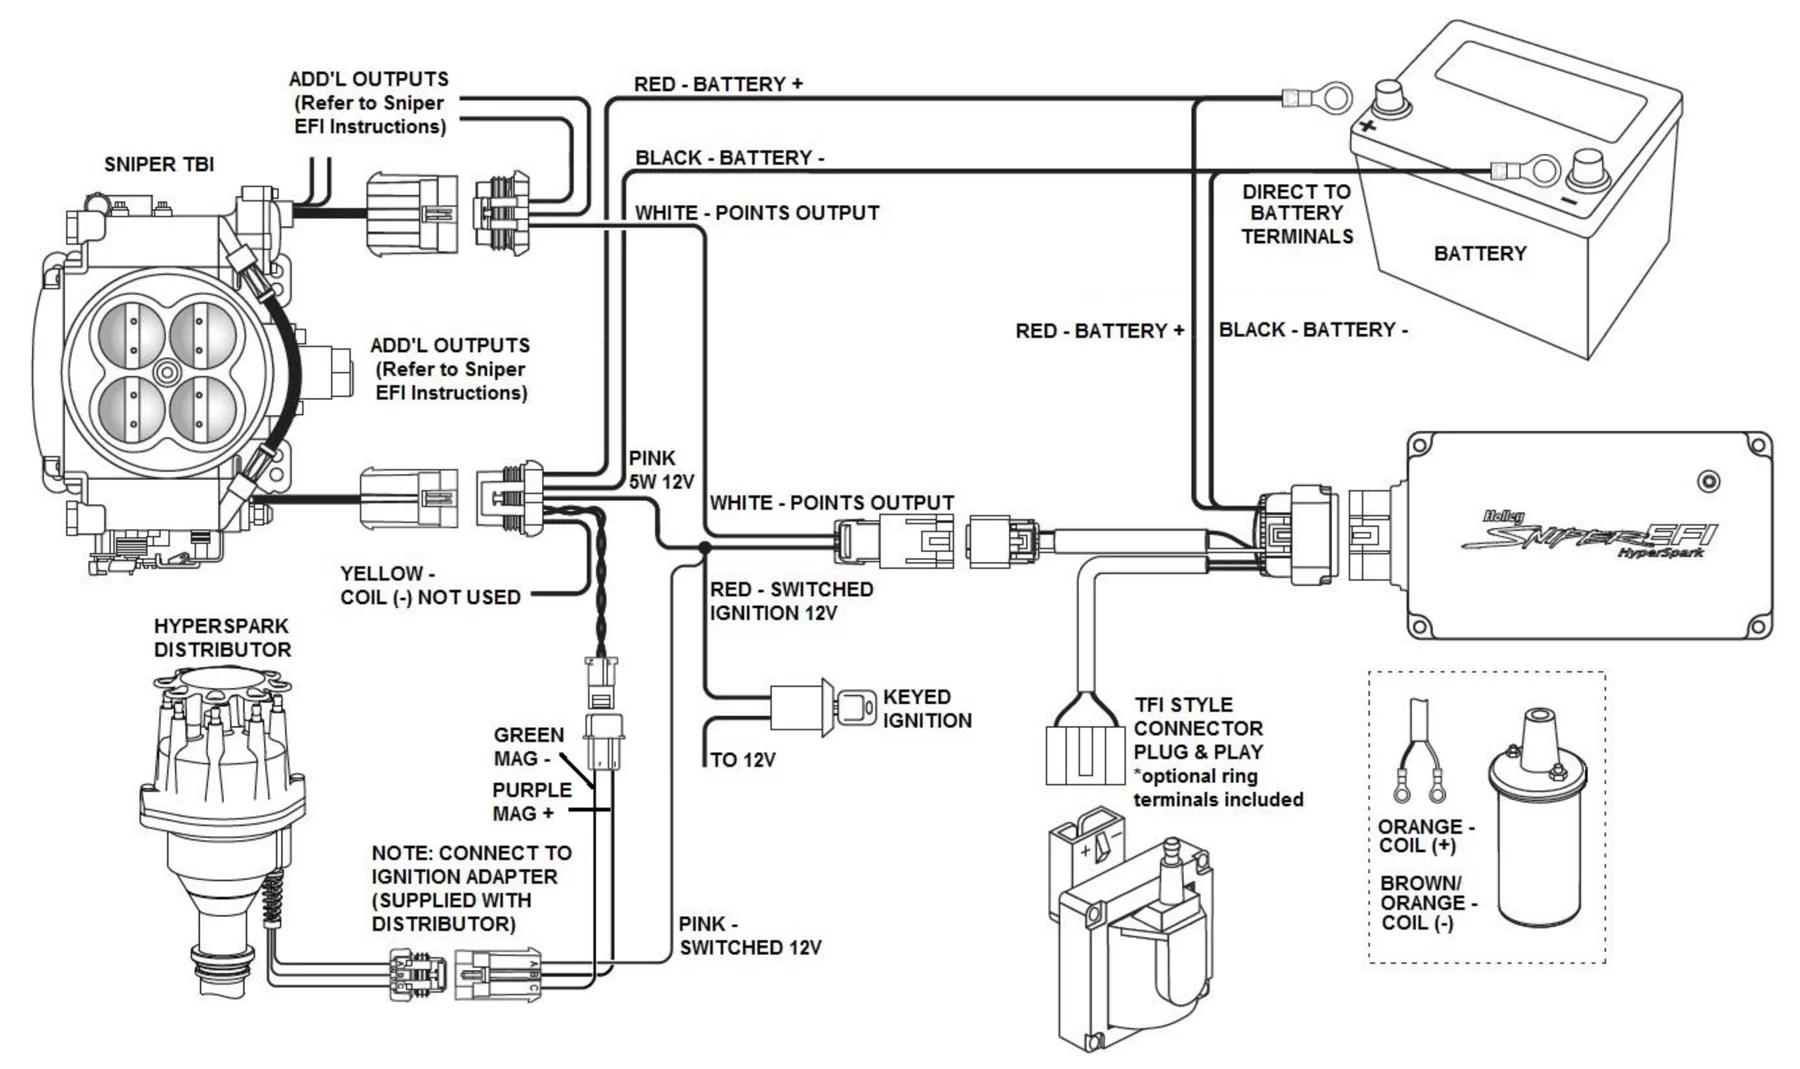 Holley Commander Wiring Diagram | Wiring Diagram on